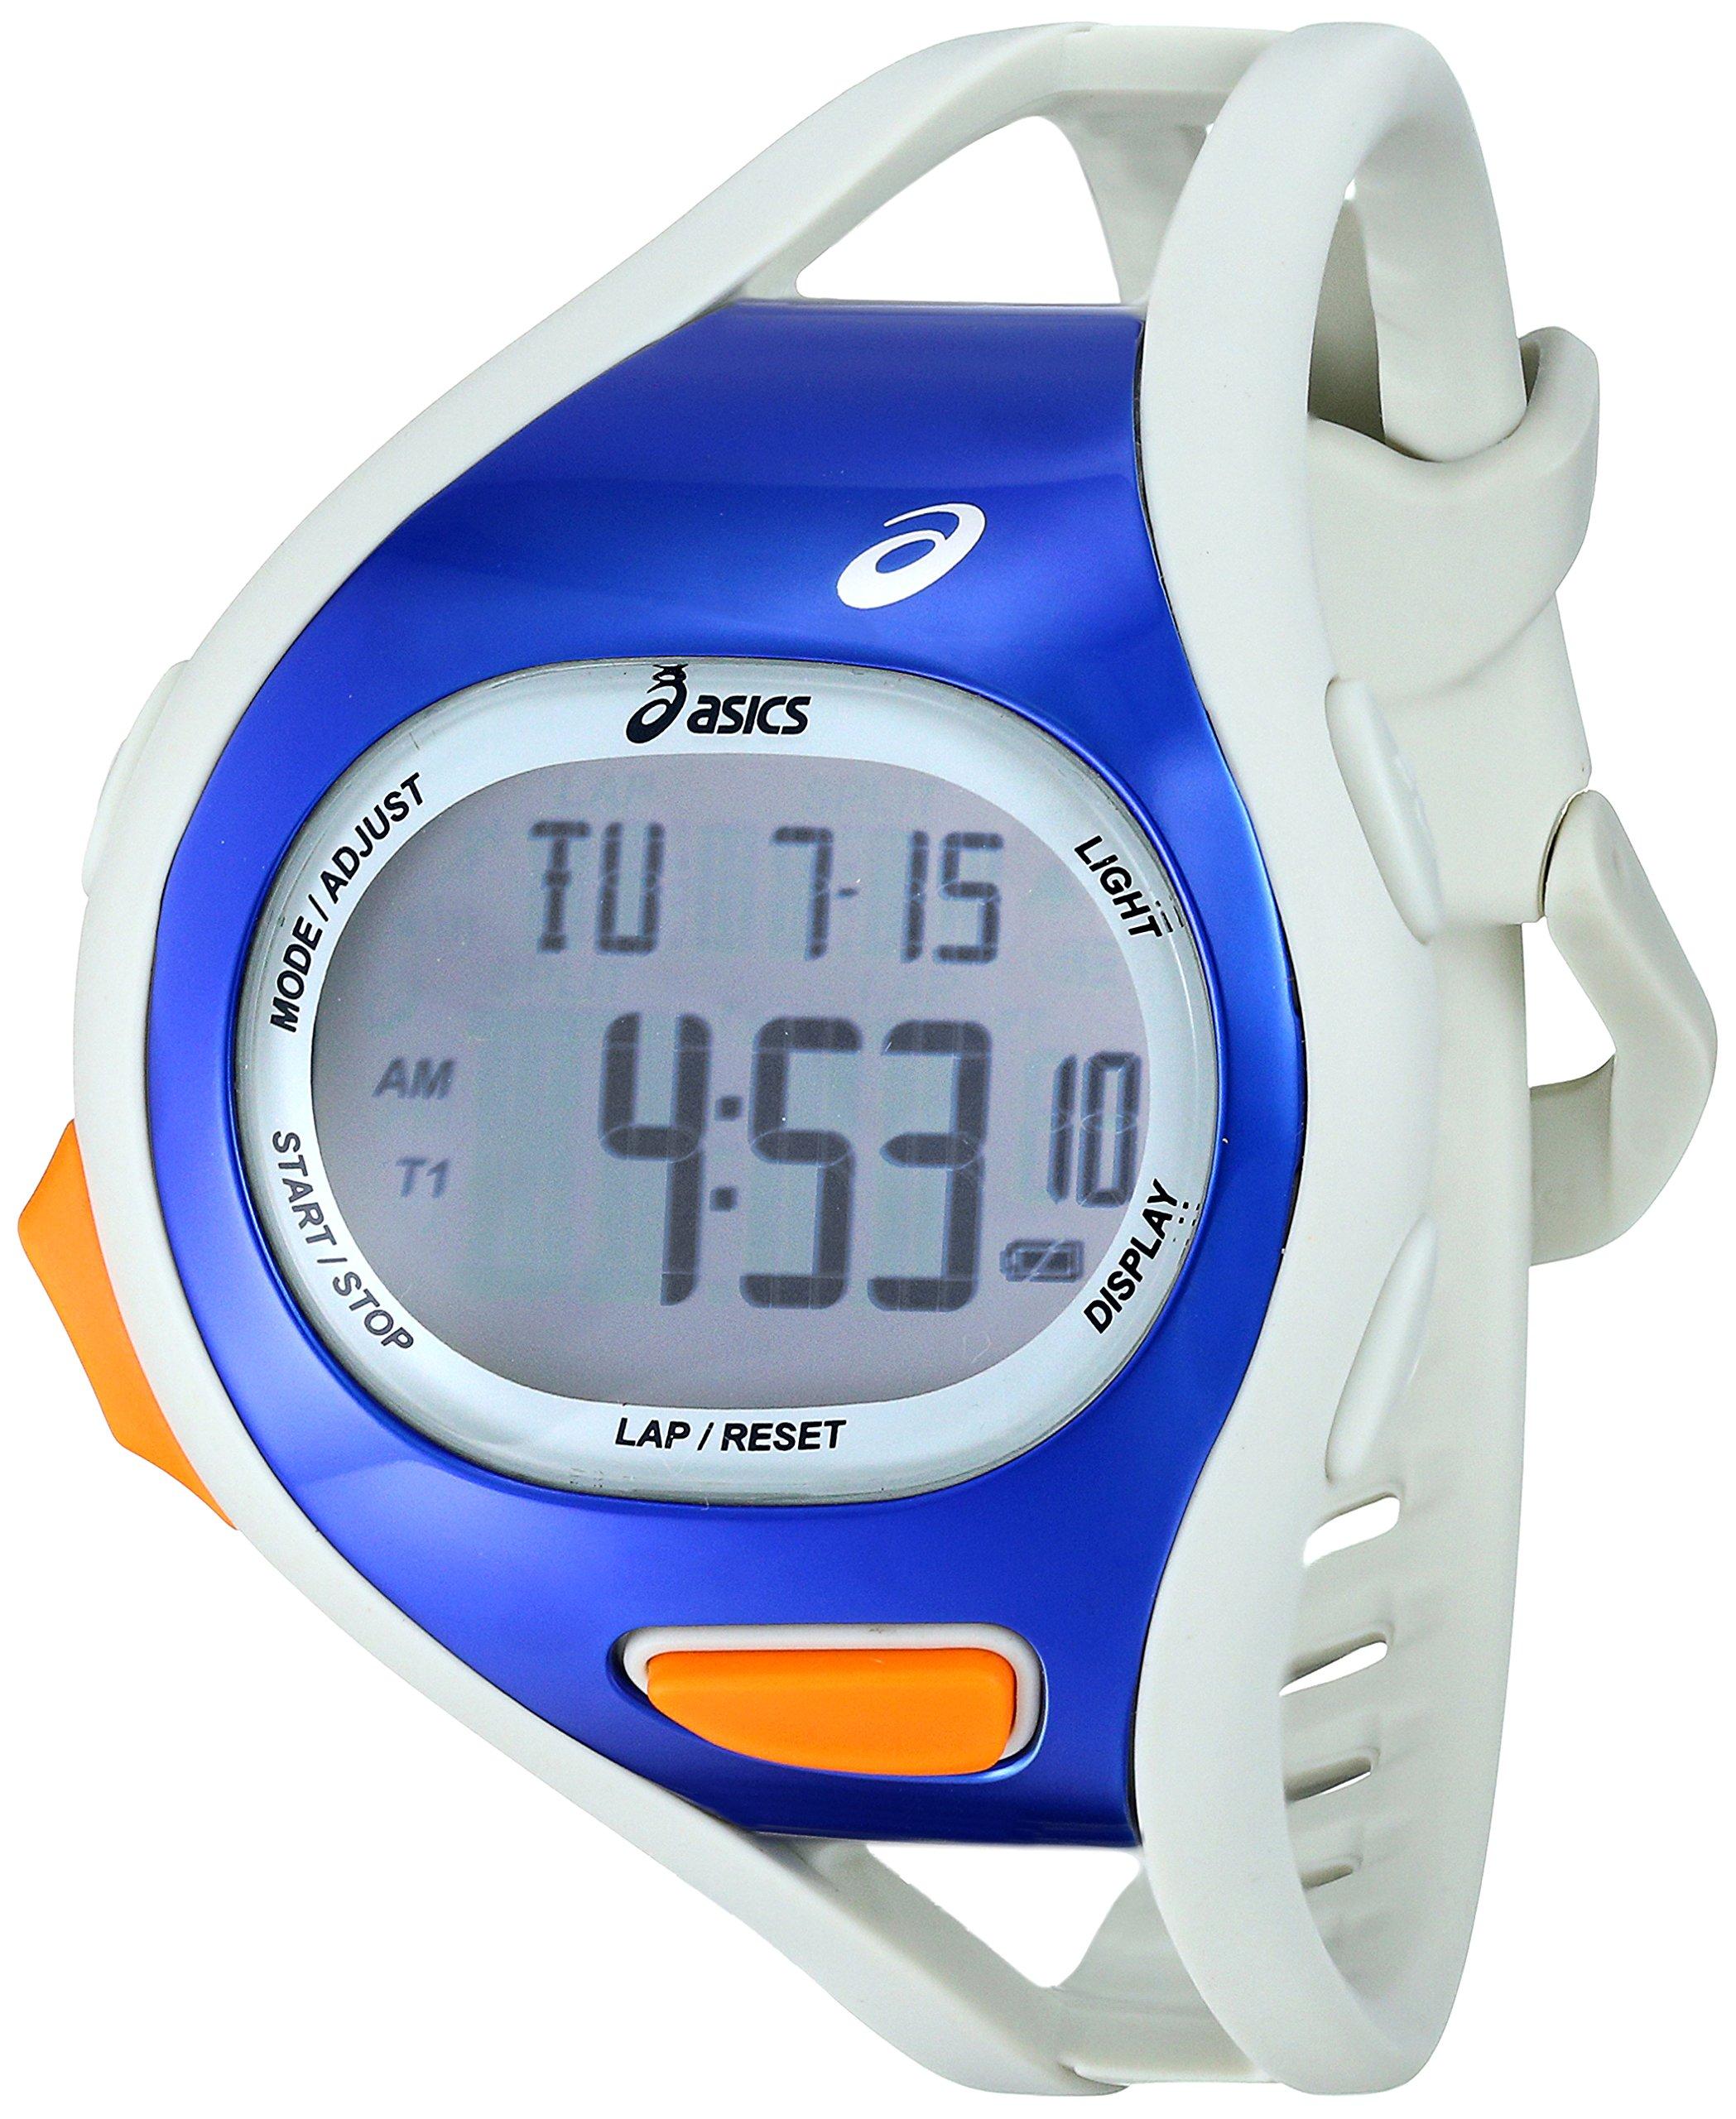 Asics Men's CQAR0703 Digital Display Quartz White Watch